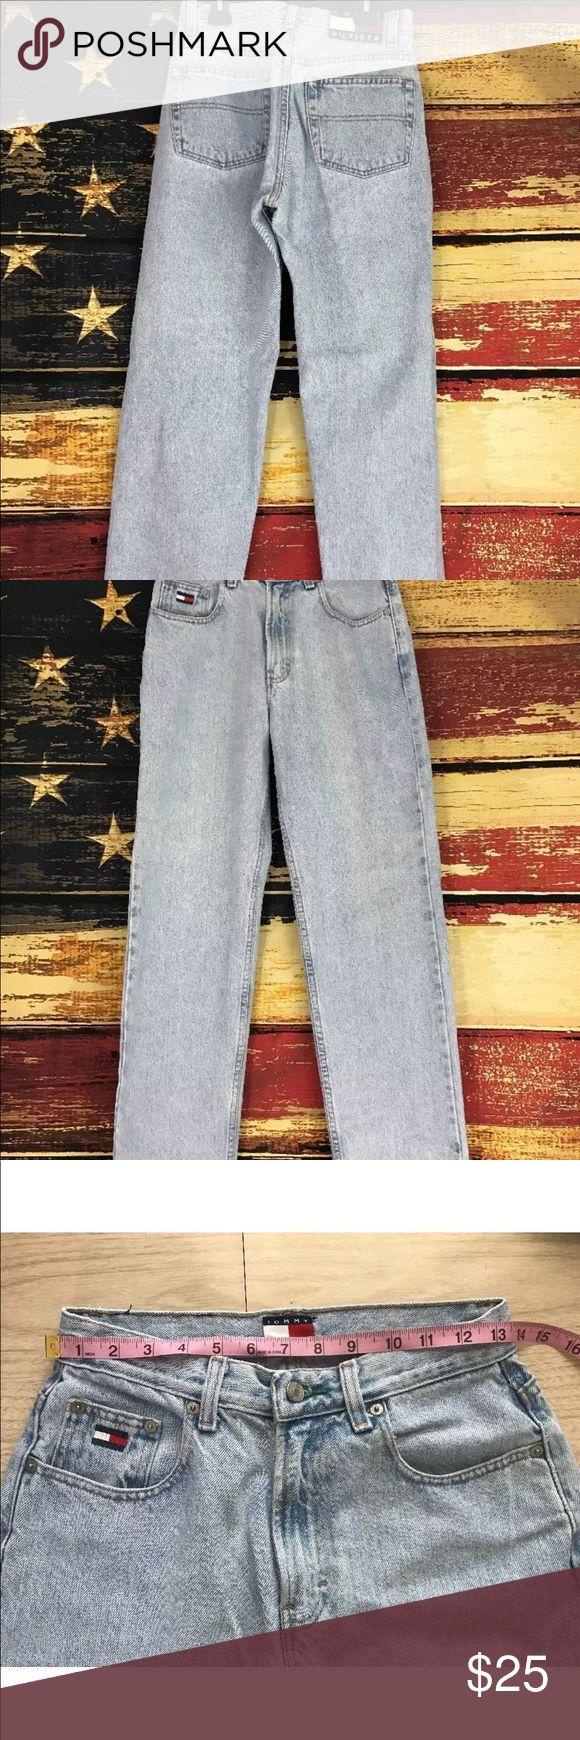 Vintage 90's Women's size 8 Tommy Hilfiger jeans Women's Tommy Hilfiger jeans size 8. 26 x 27 1/2. Tommy Hilfiger Jeans Straight Leg